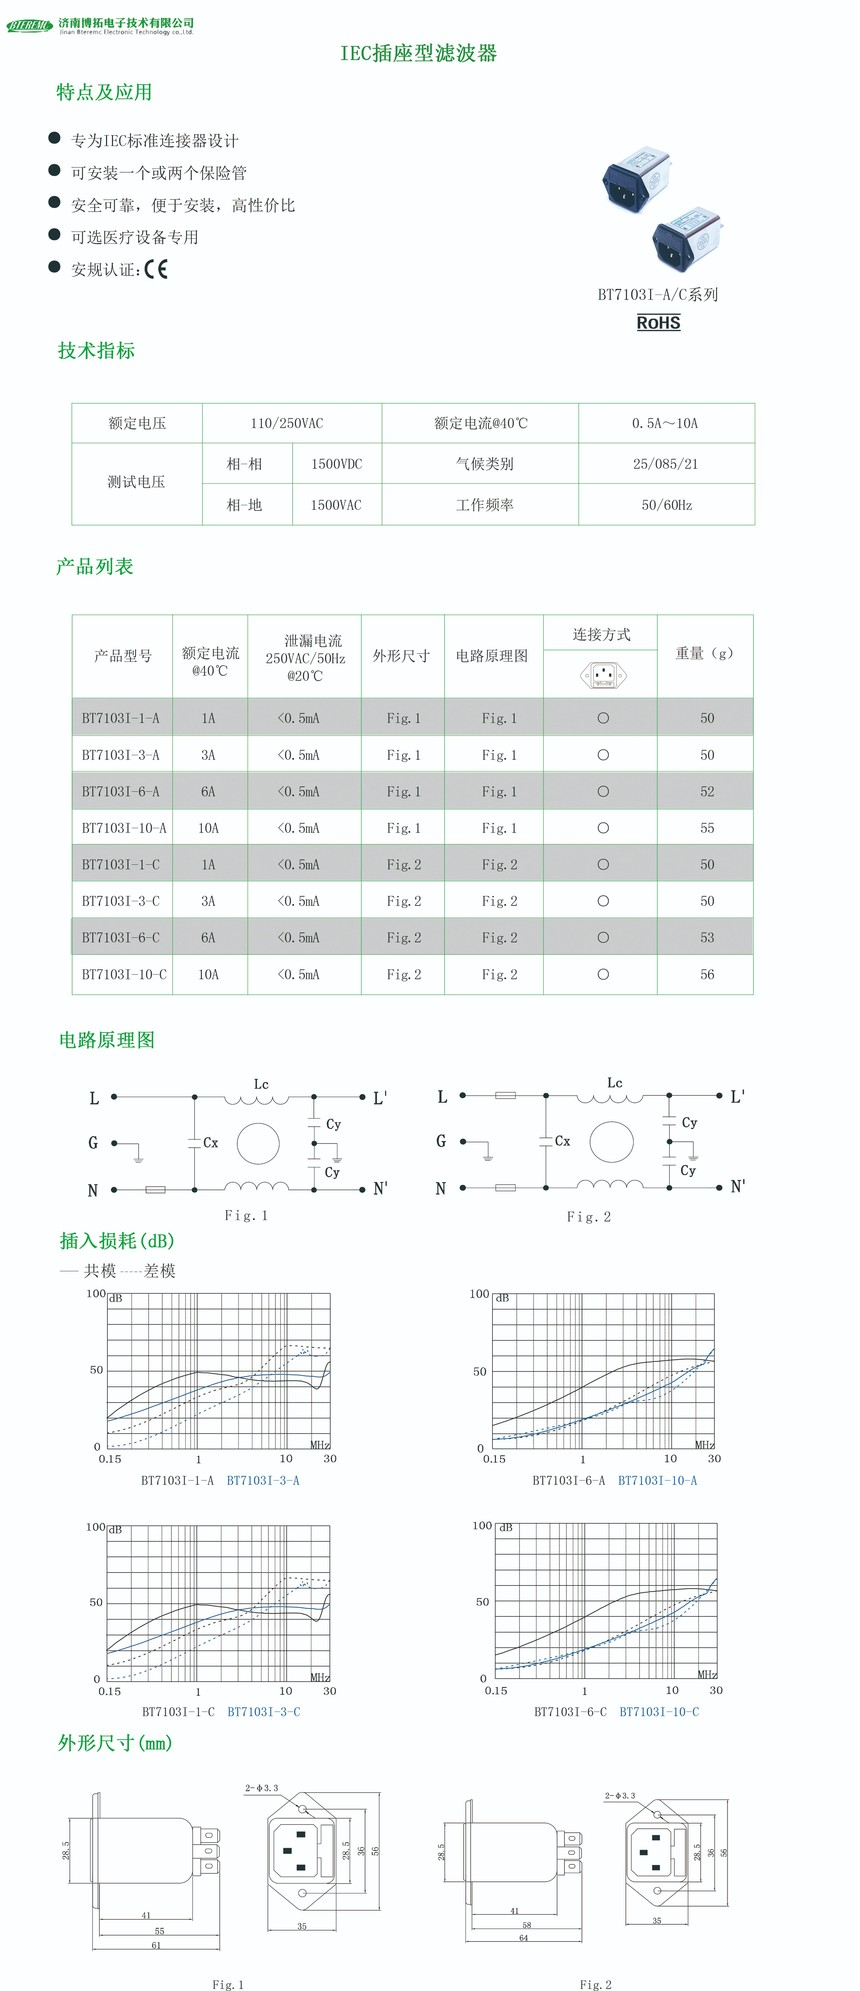 BT7103I-A-C系列中文31-32.jpg